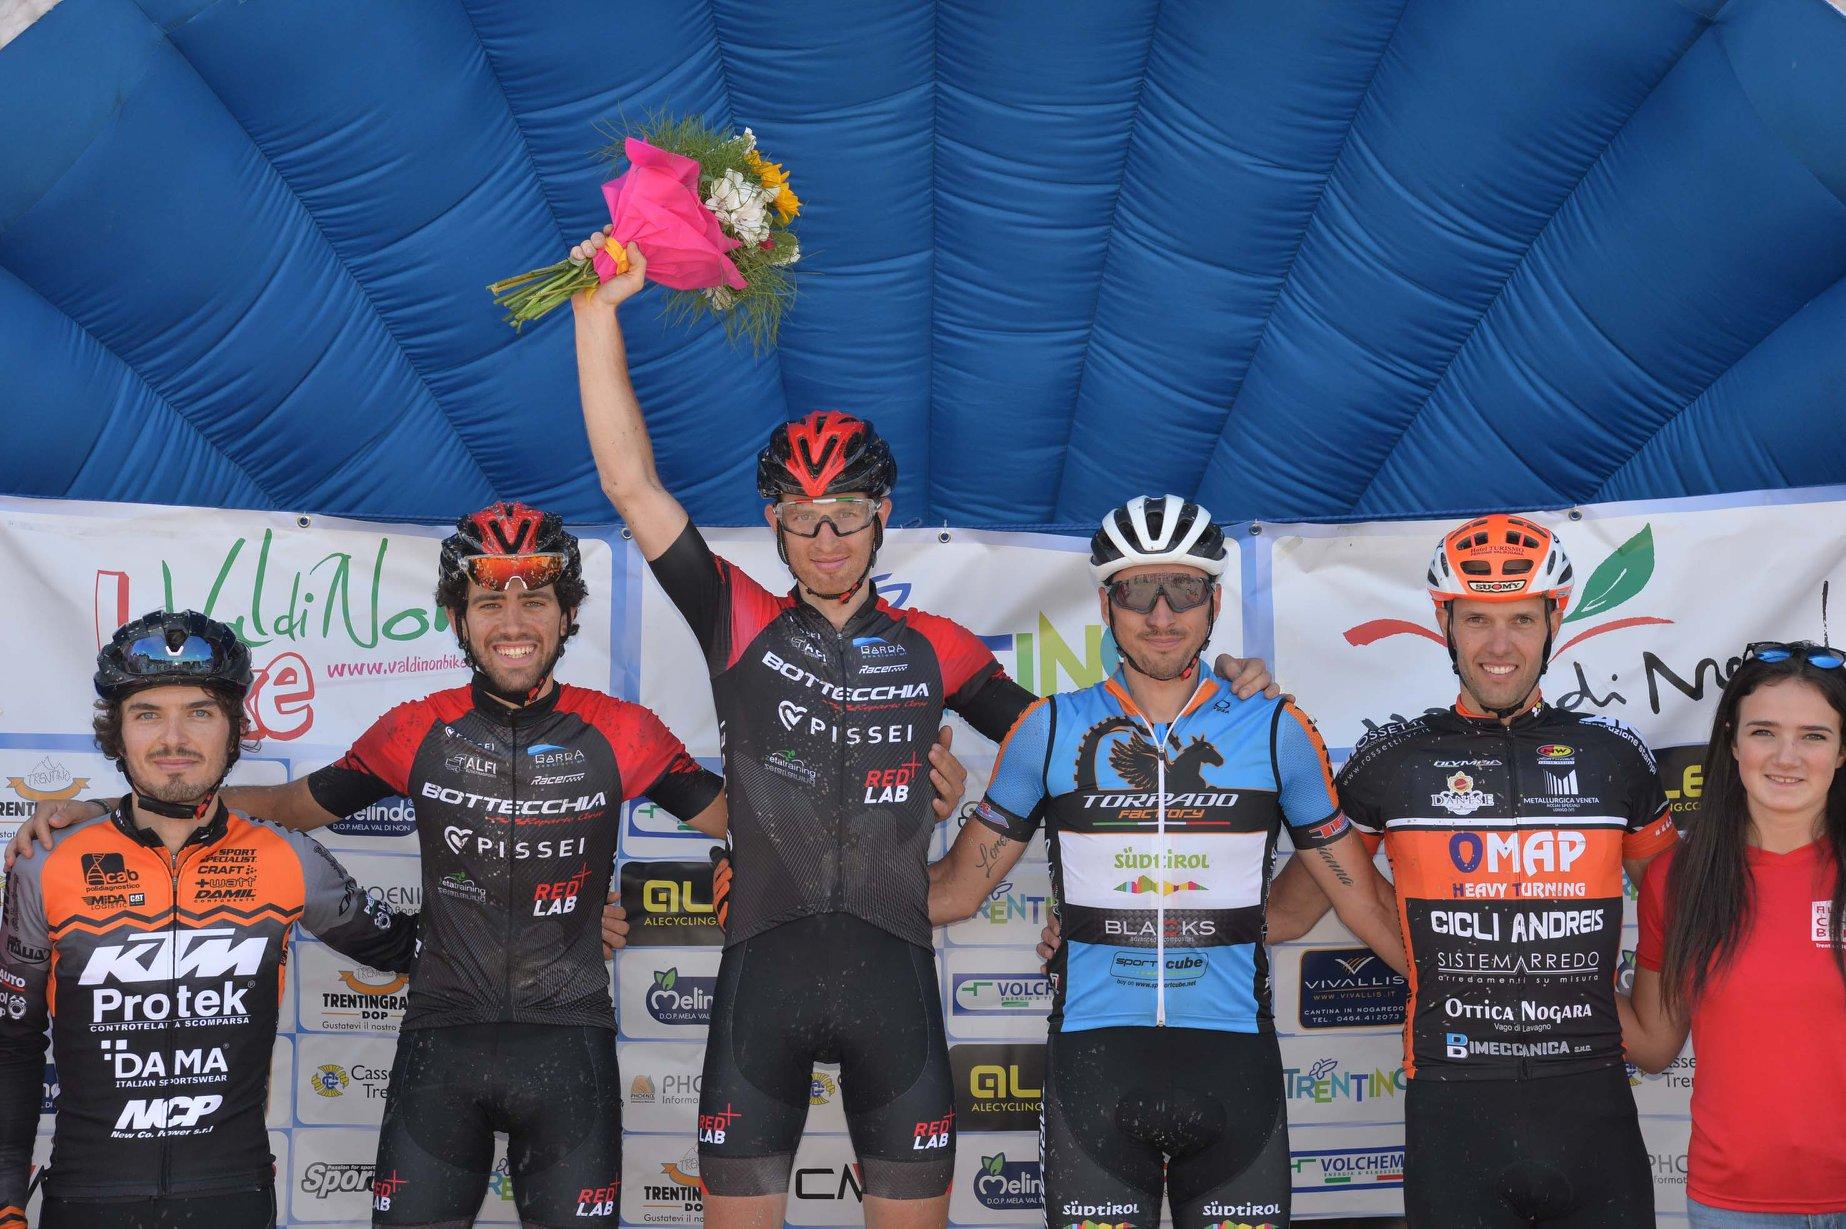 Nosellari Bike 2019 podio maschile